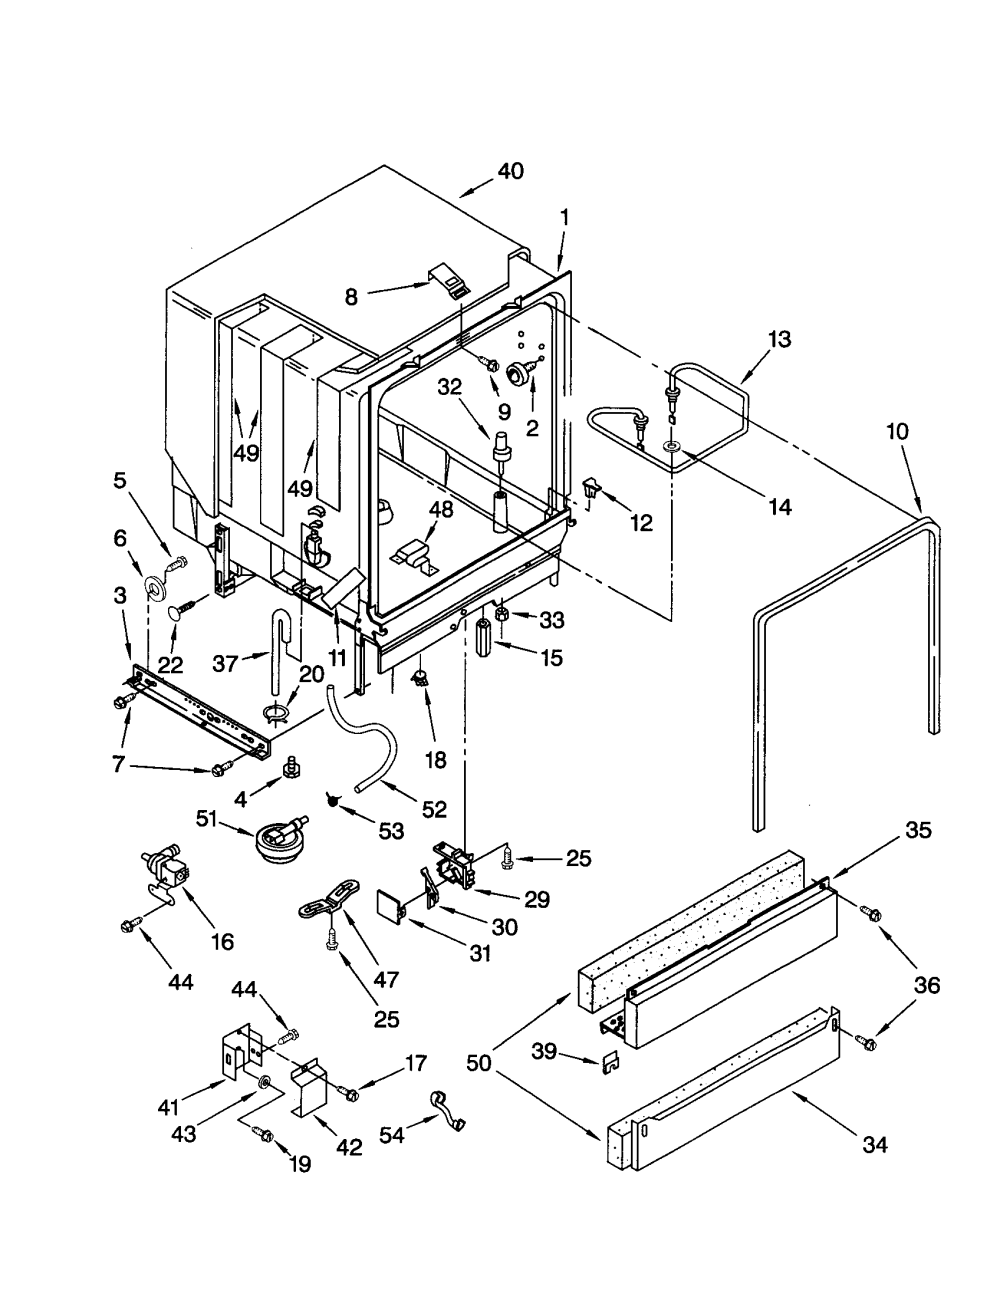 medium resolution of kenmore dishwasher schematic schematic diagram database kenmore dishwasher schematic kenmore dishwasher schematic